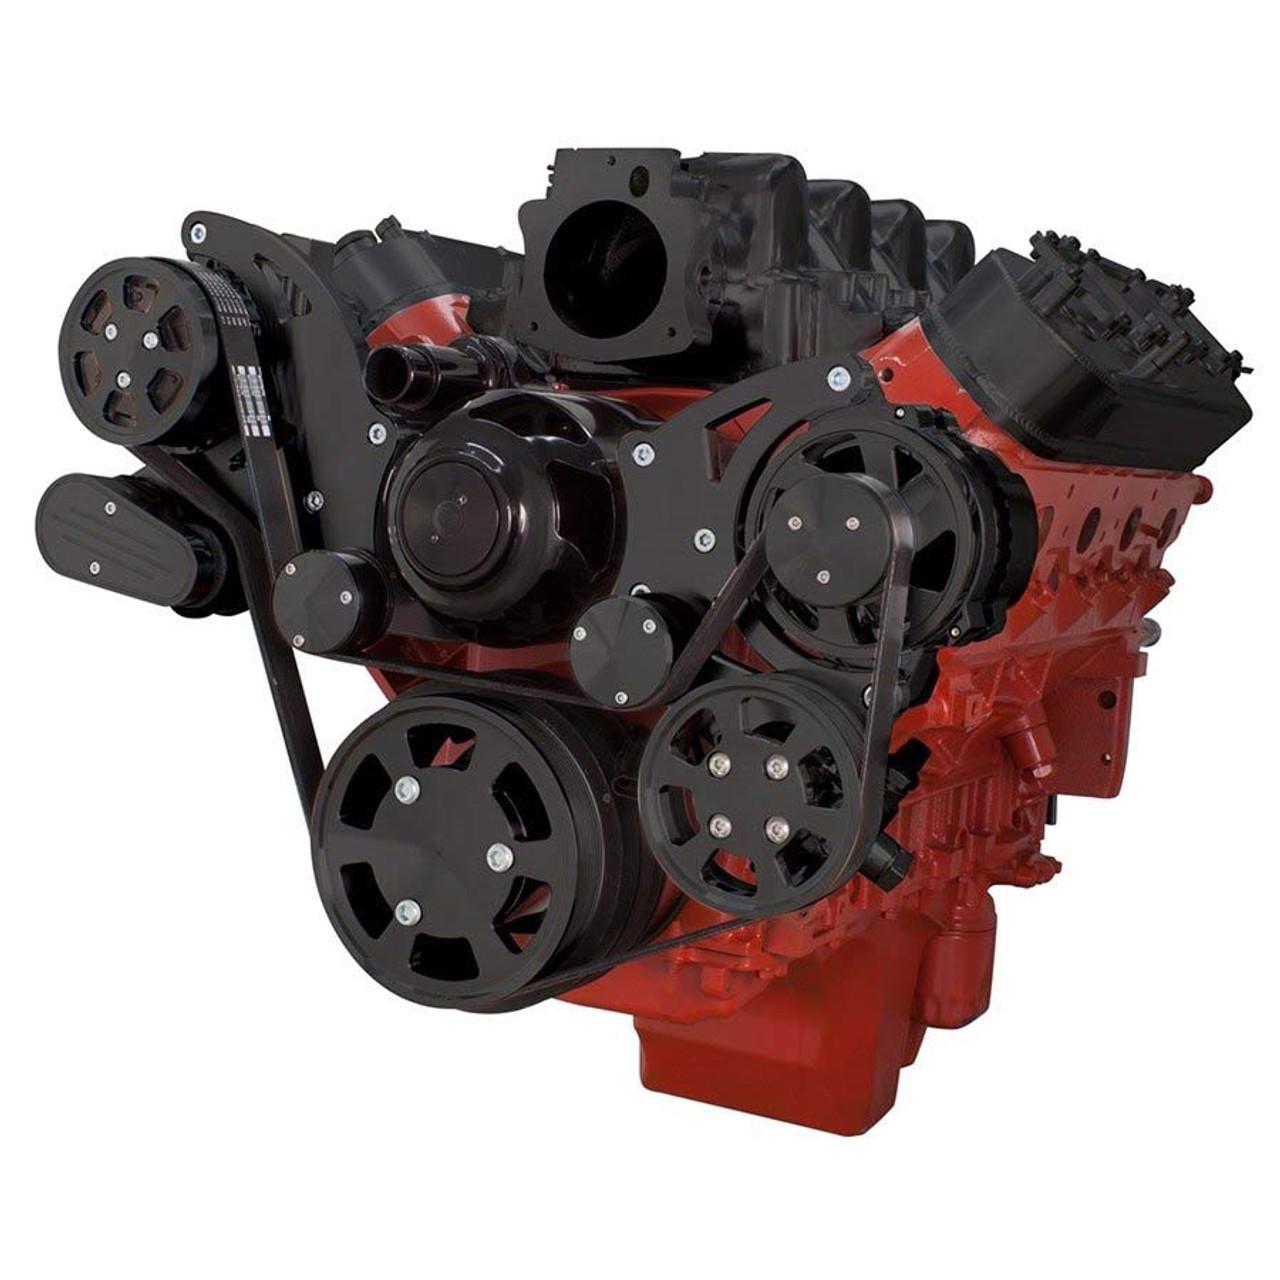 Stealth Black Chevy LS Engine High Mount Serpentine Kit - AC, Alternator &  Power Steering with Electric Water Pump